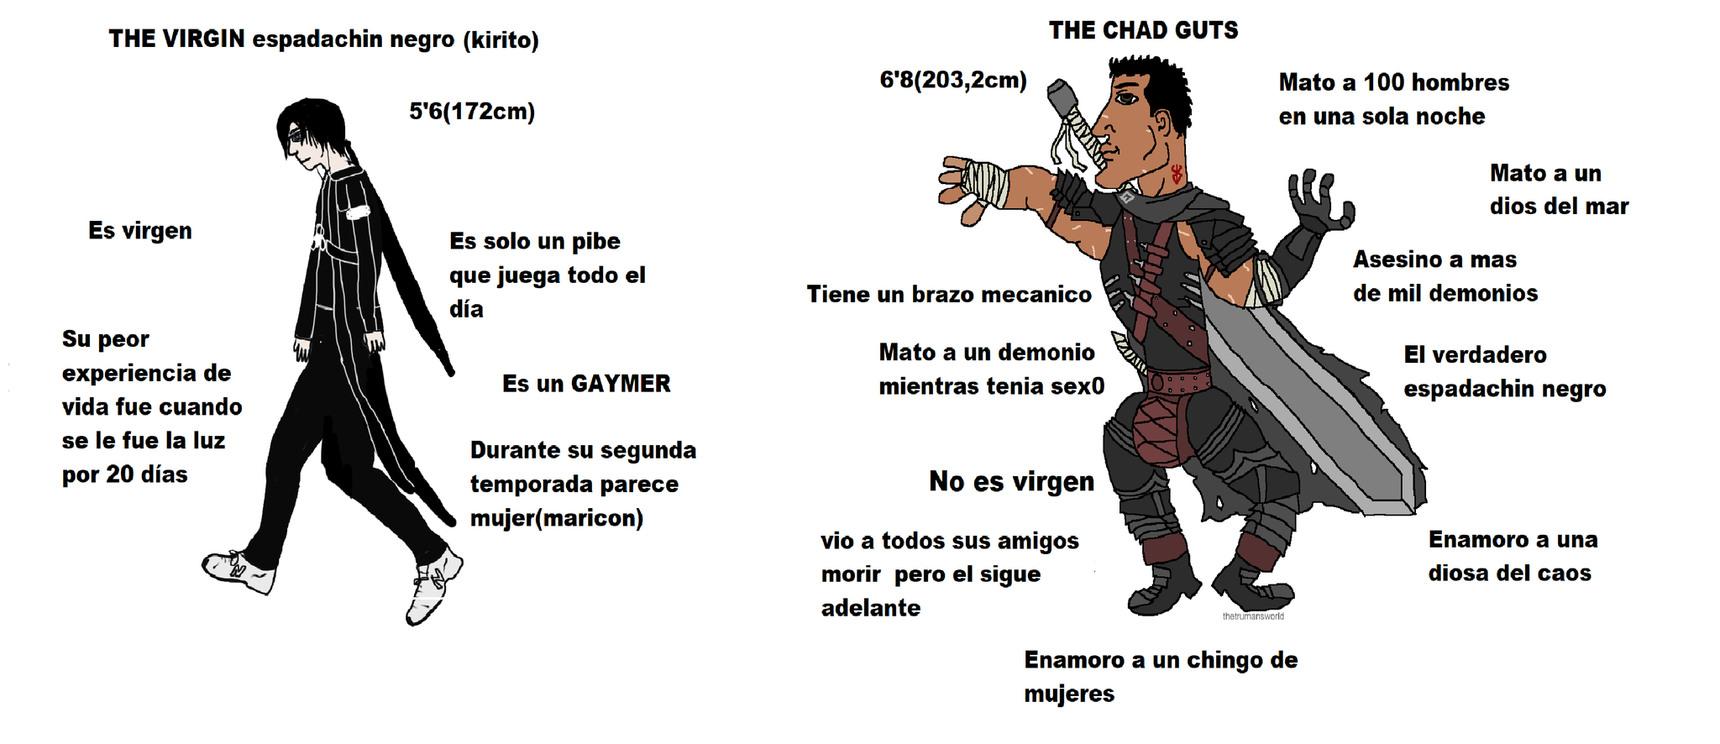 THE VIRGIN kirito vs THE CHAD guts - meme